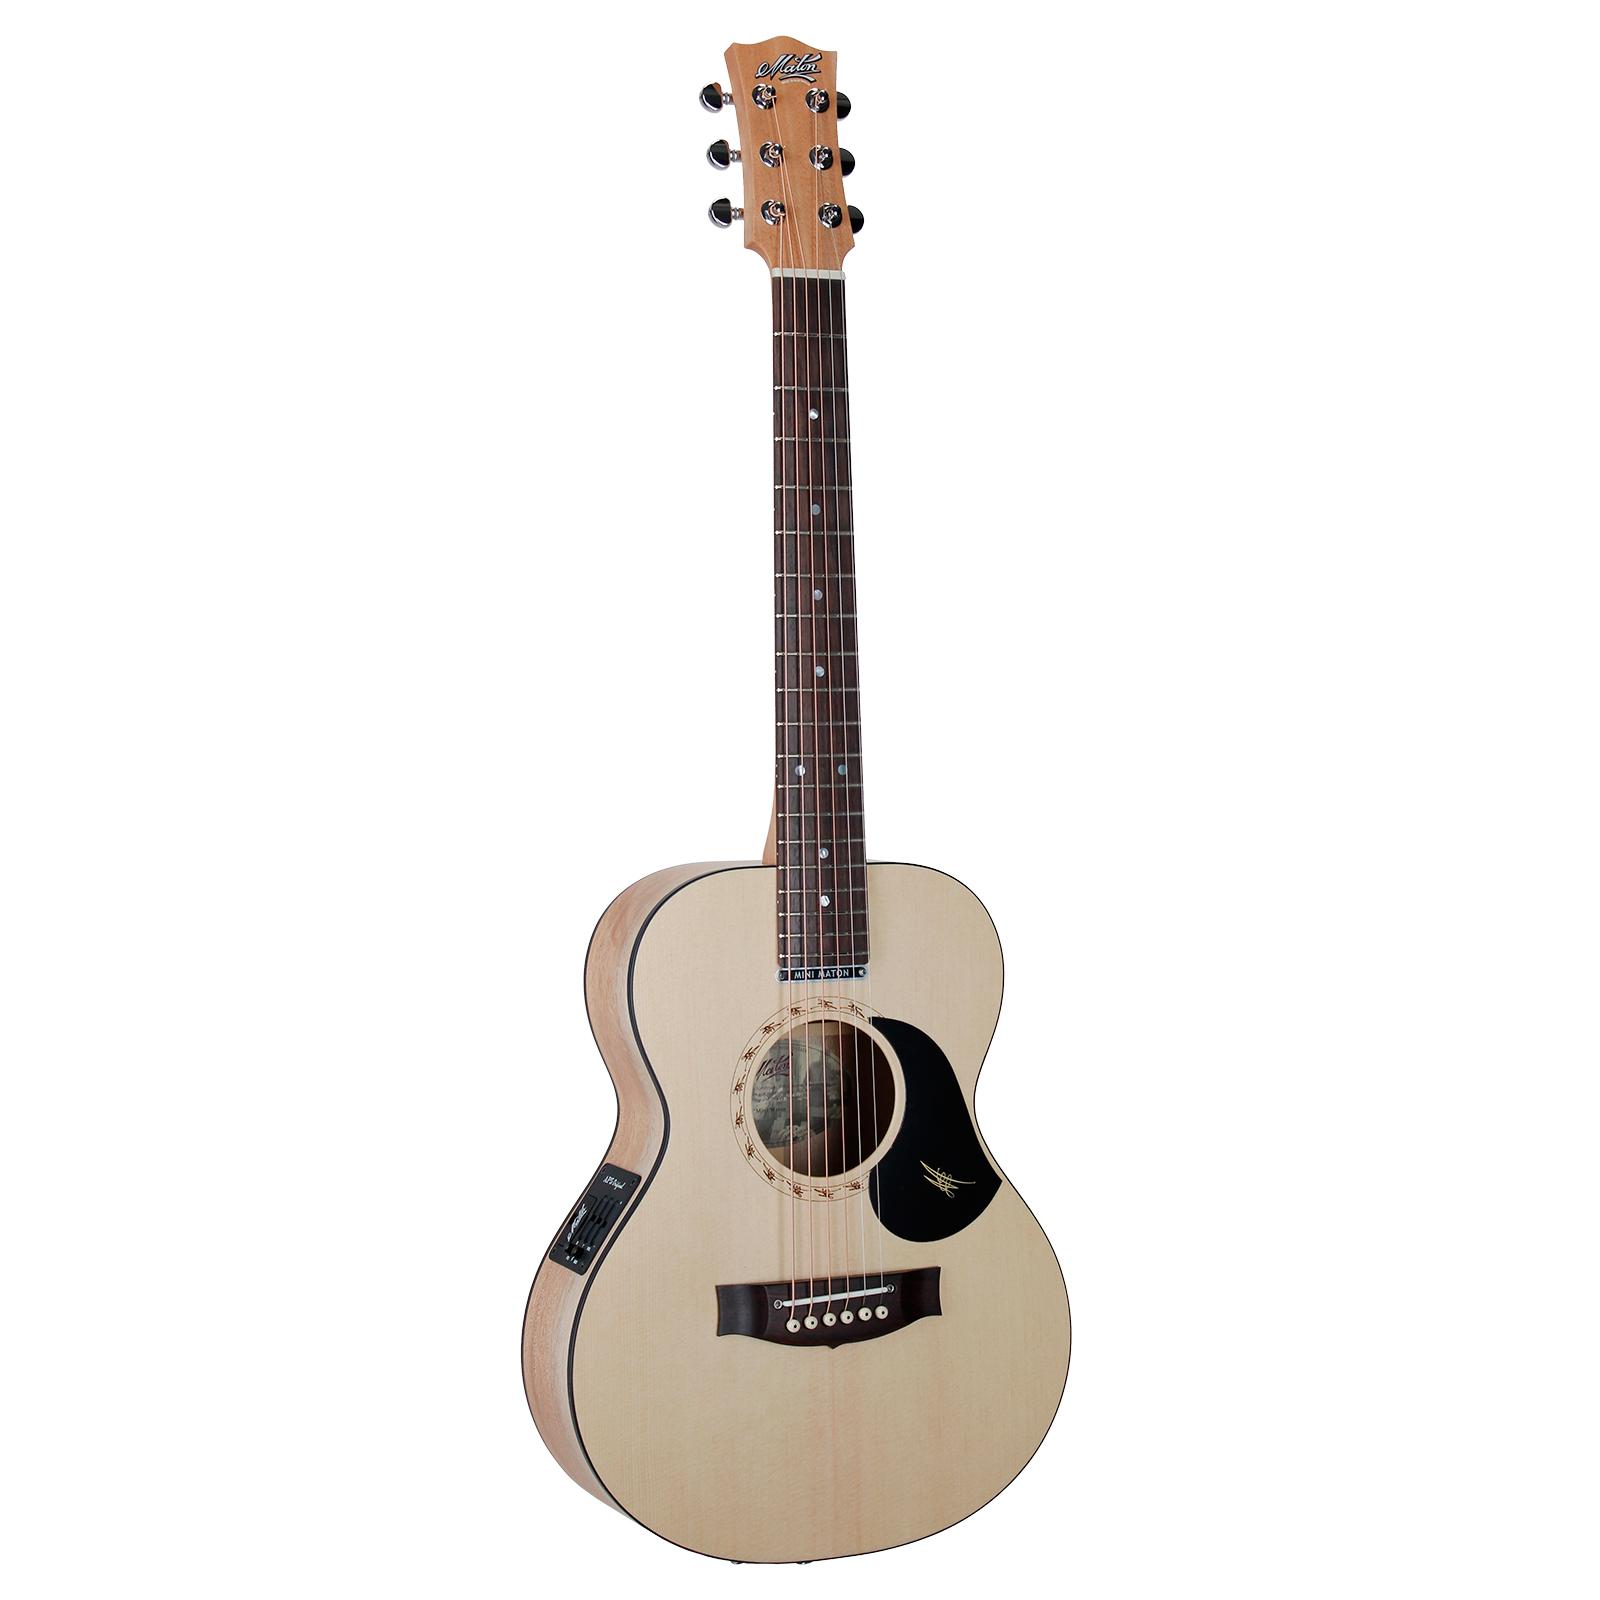 guitare maton pas cher mes instruments. Black Bedroom Furniture Sets. Home Design Ideas